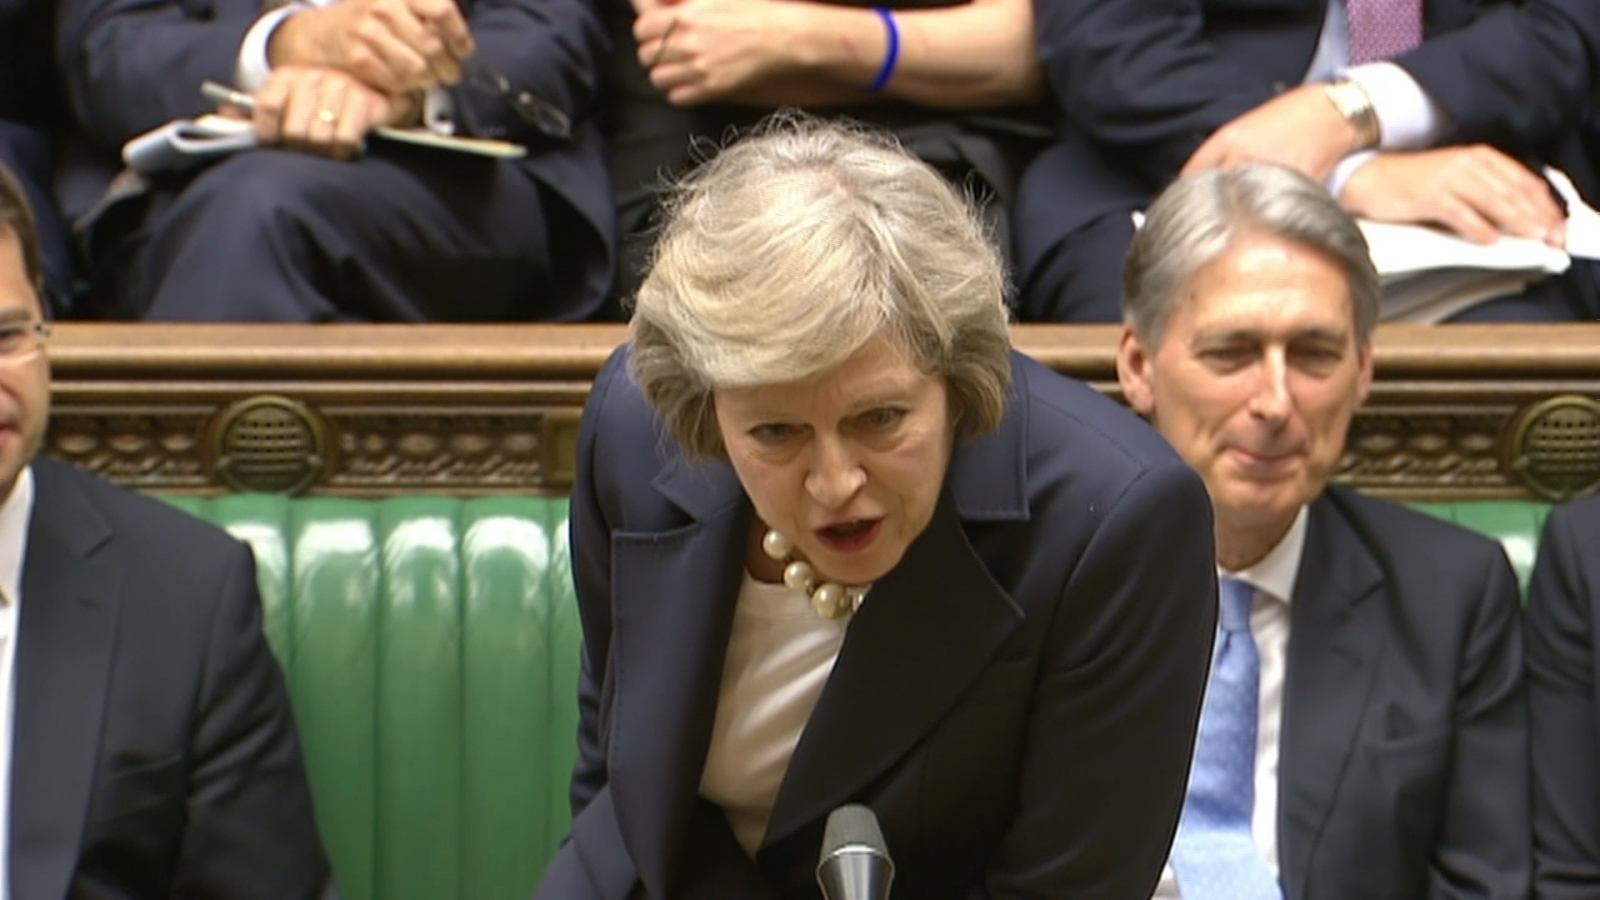 Theresa May mocks Jeremy Corbyn